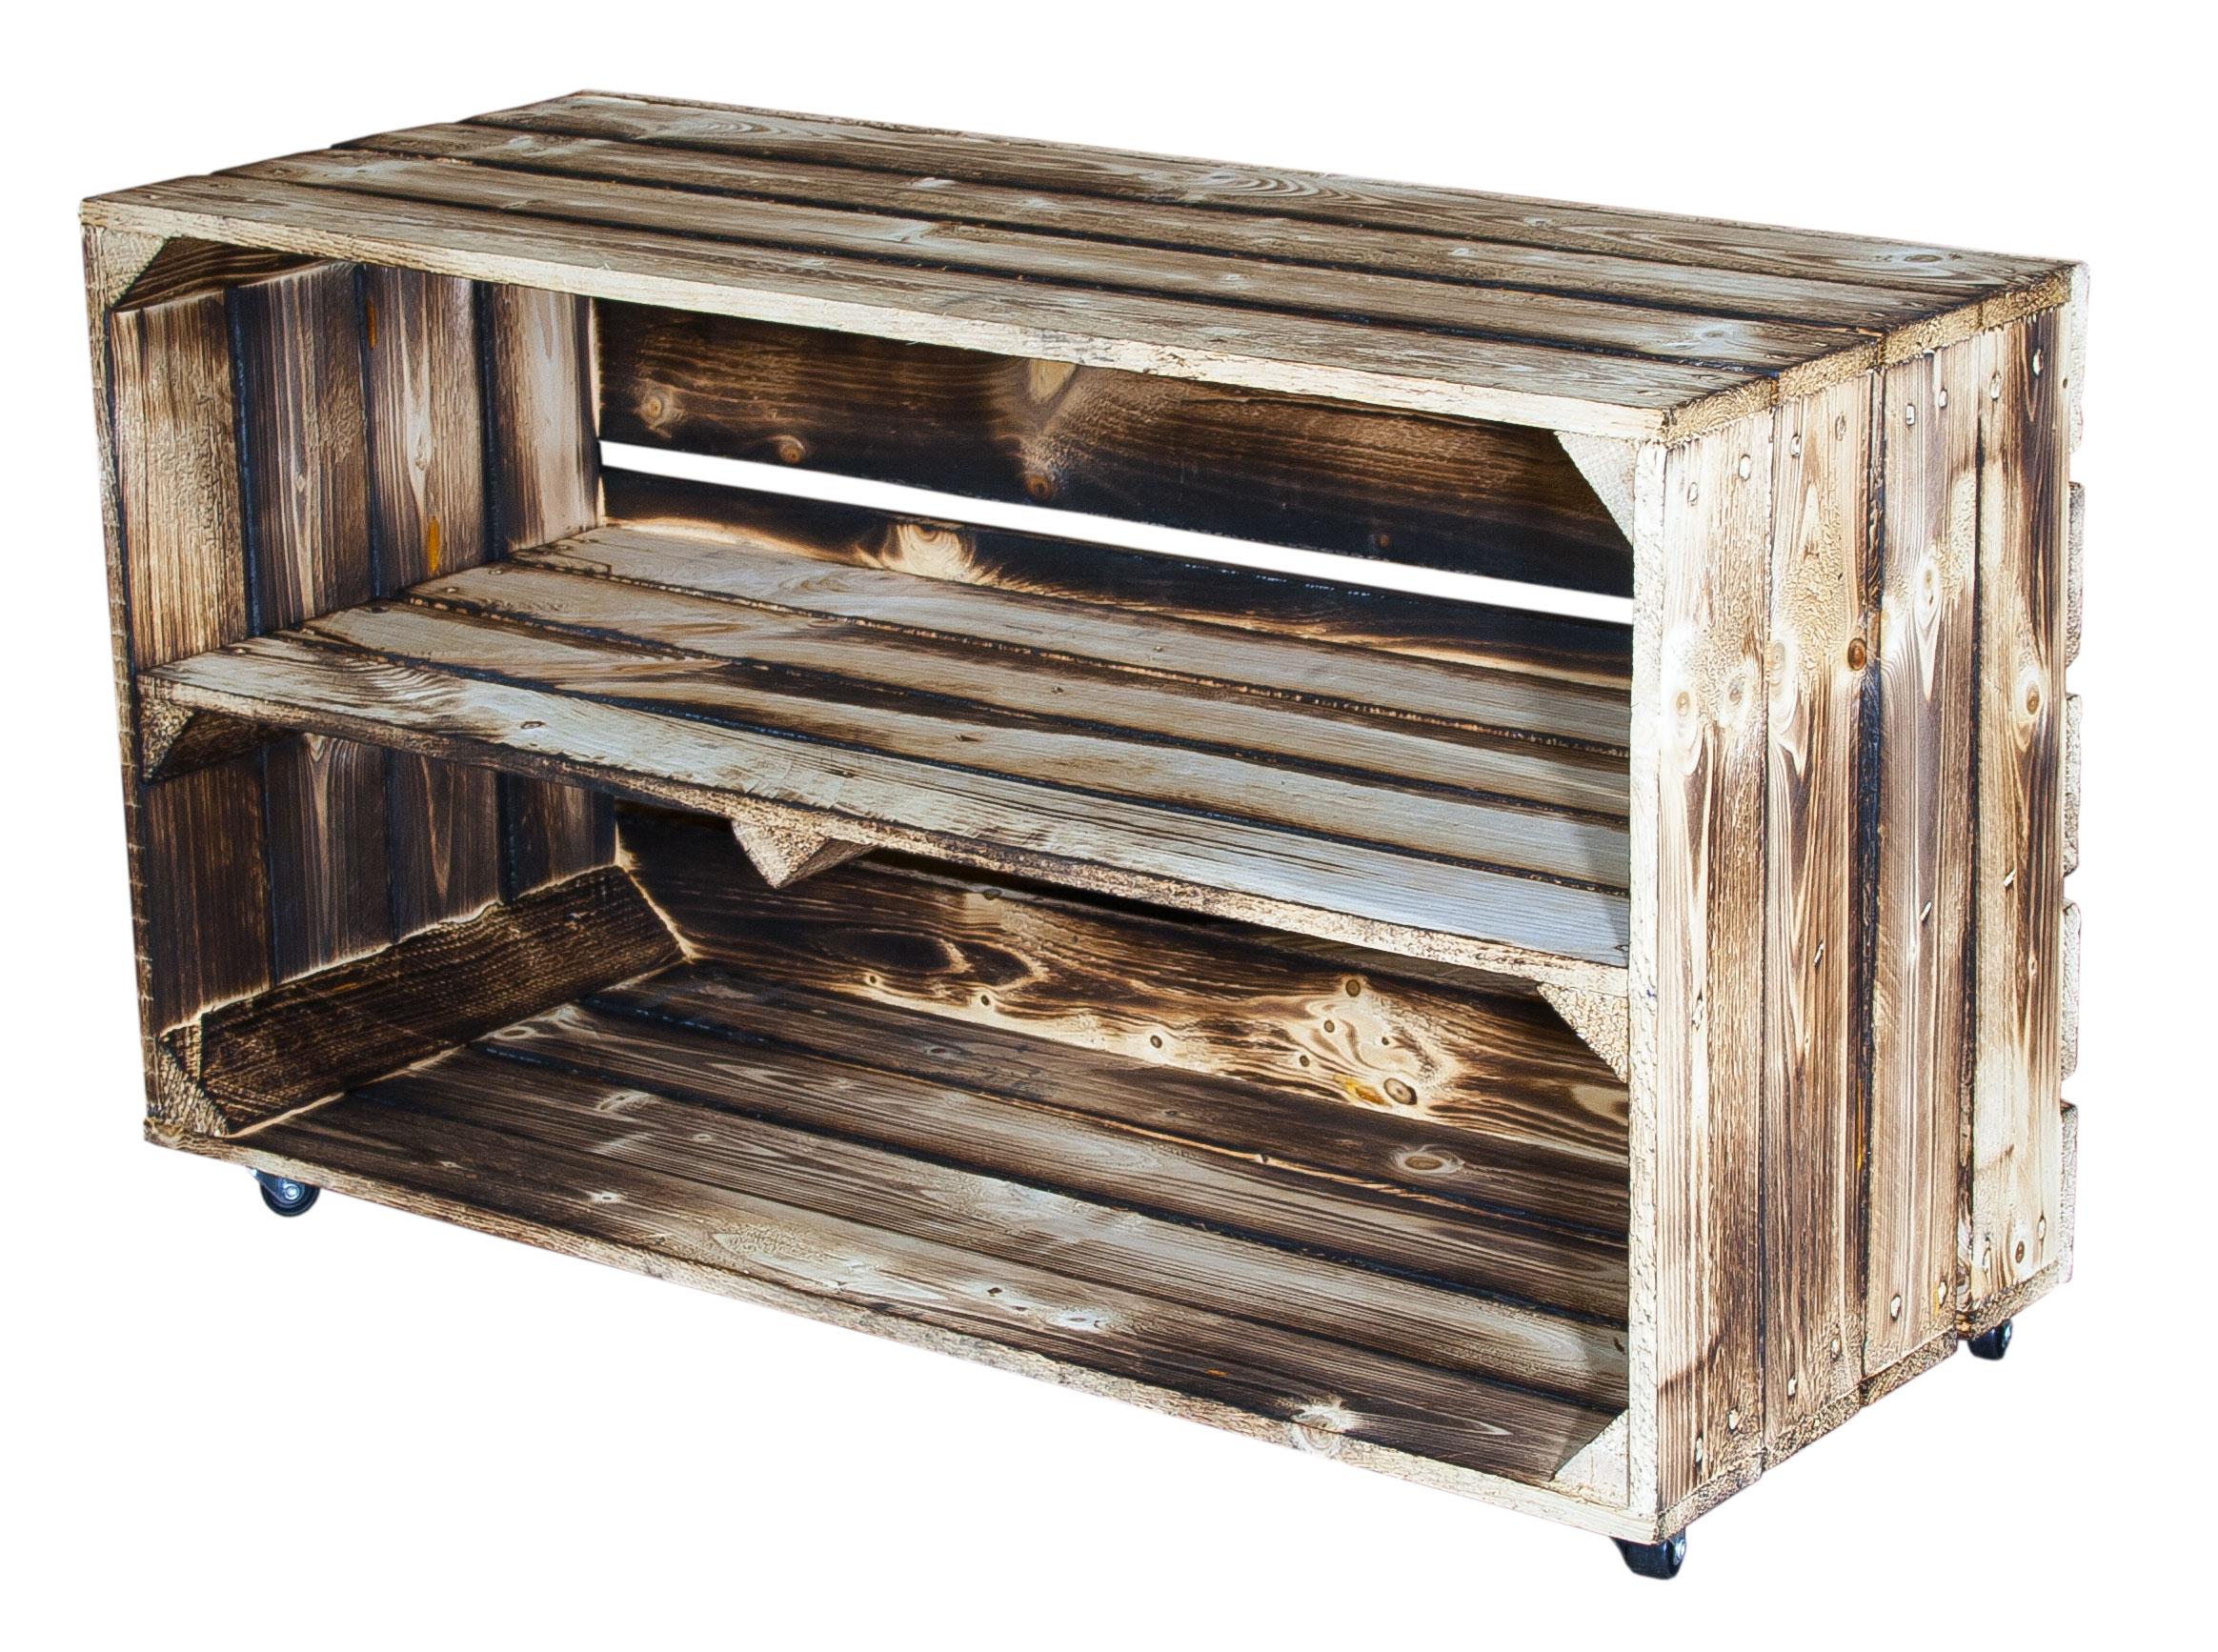 geflammte kisten gro e geflammte holzkiste mit. Black Bedroom Furniture Sets. Home Design Ideas